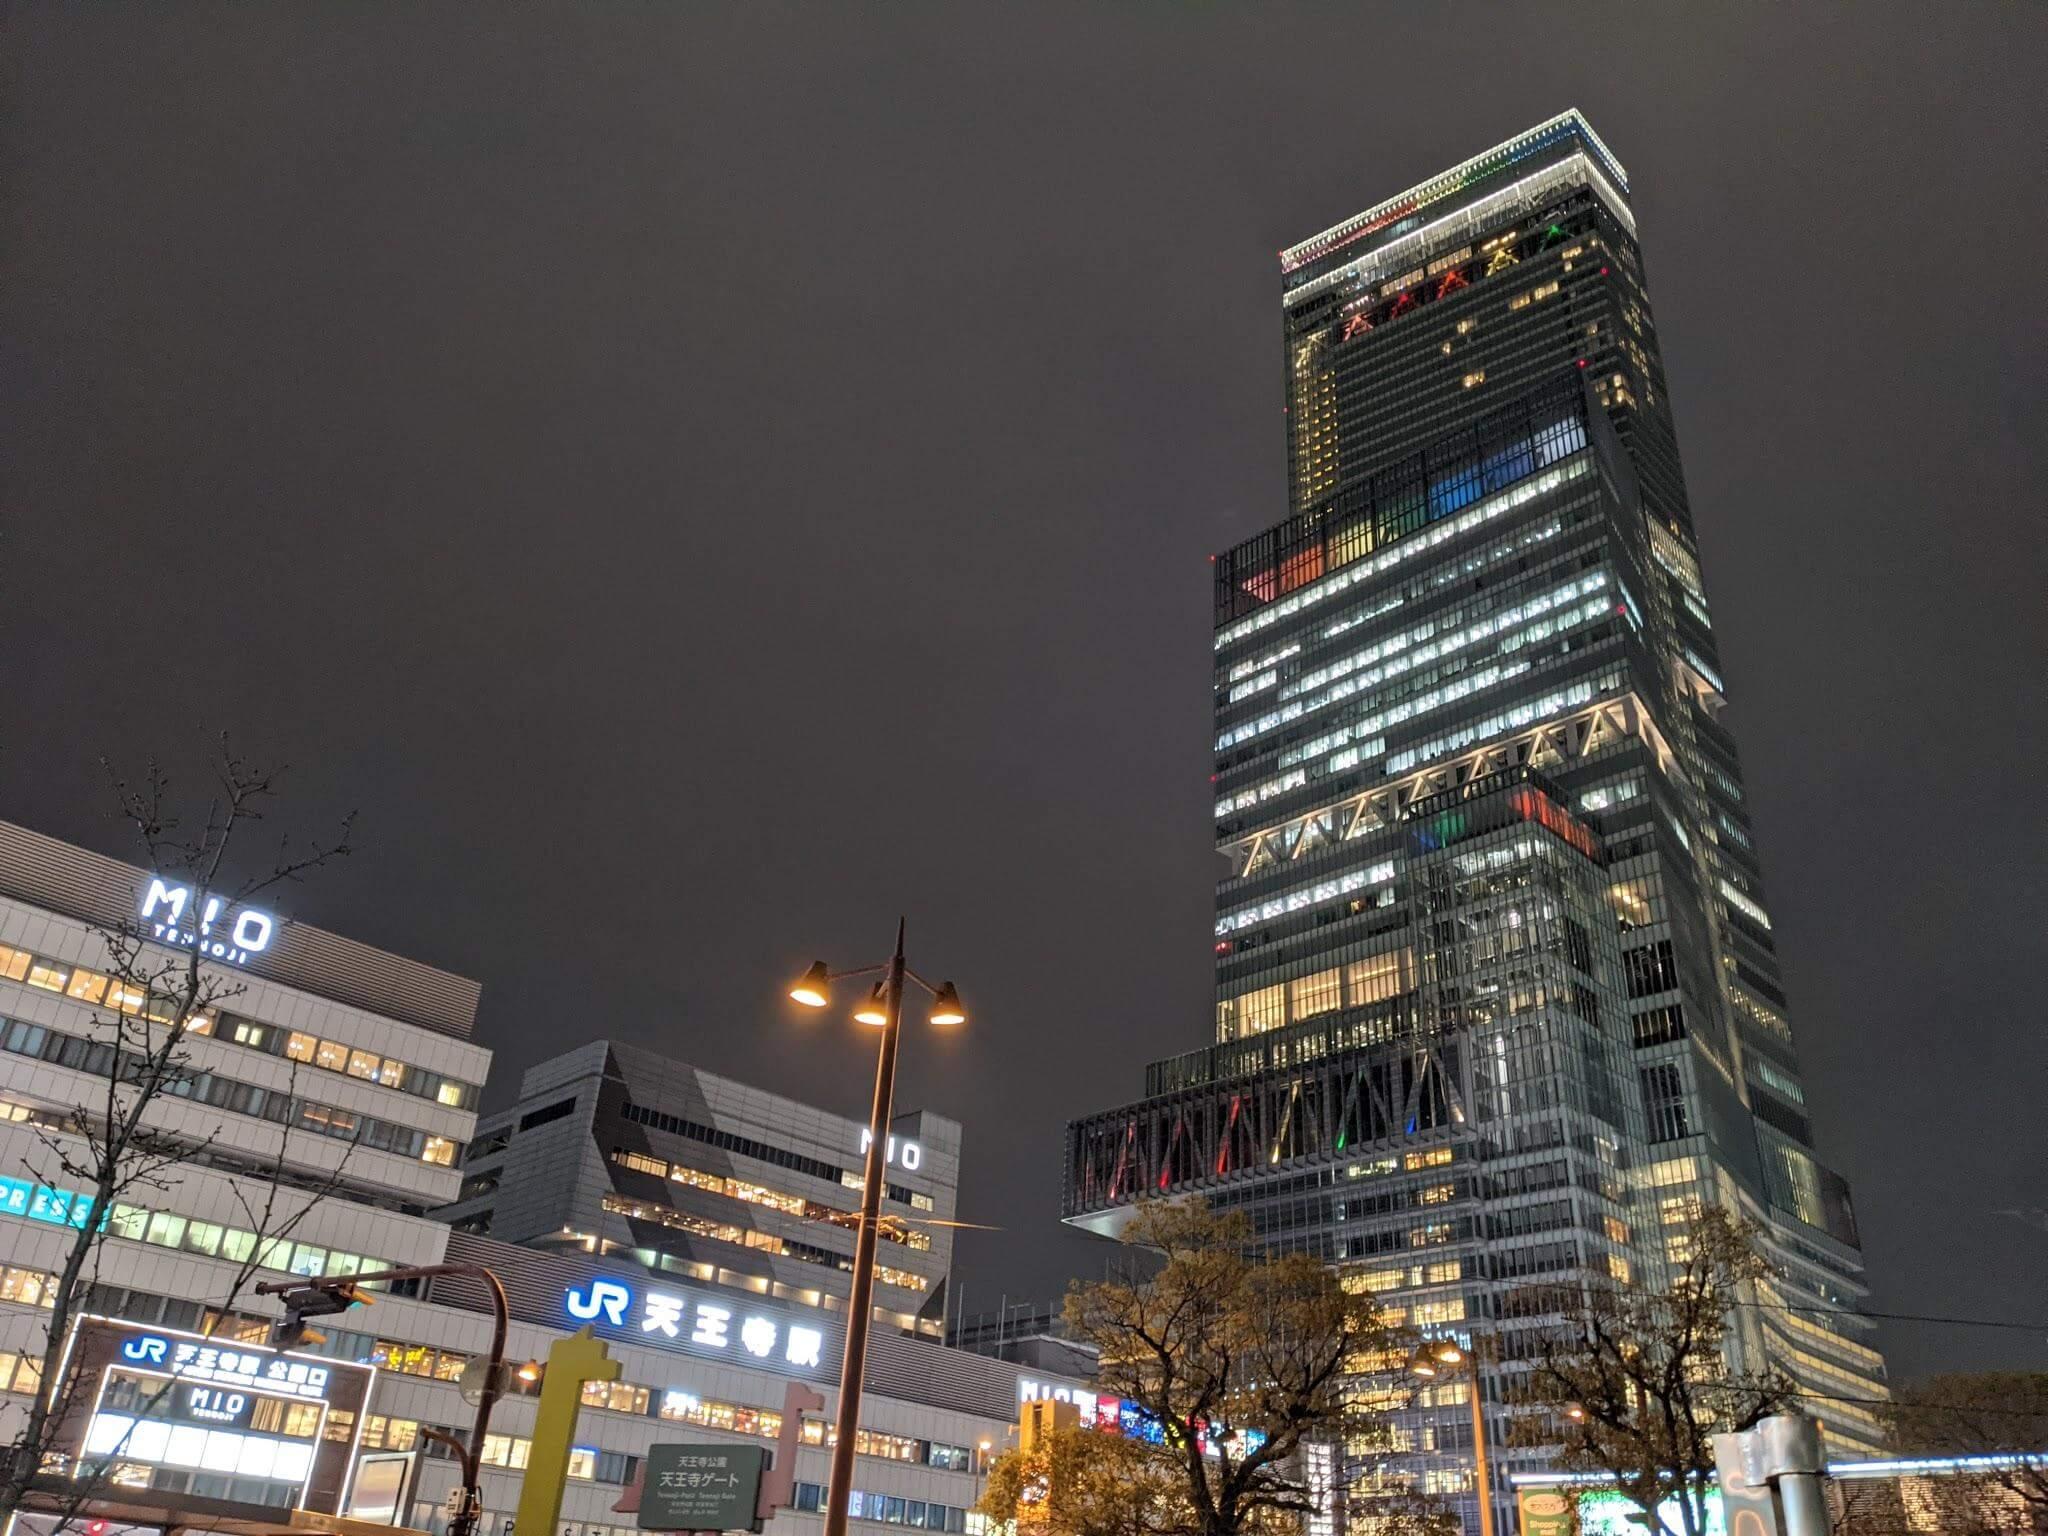 Abeno Harukas Skyscraper osaka